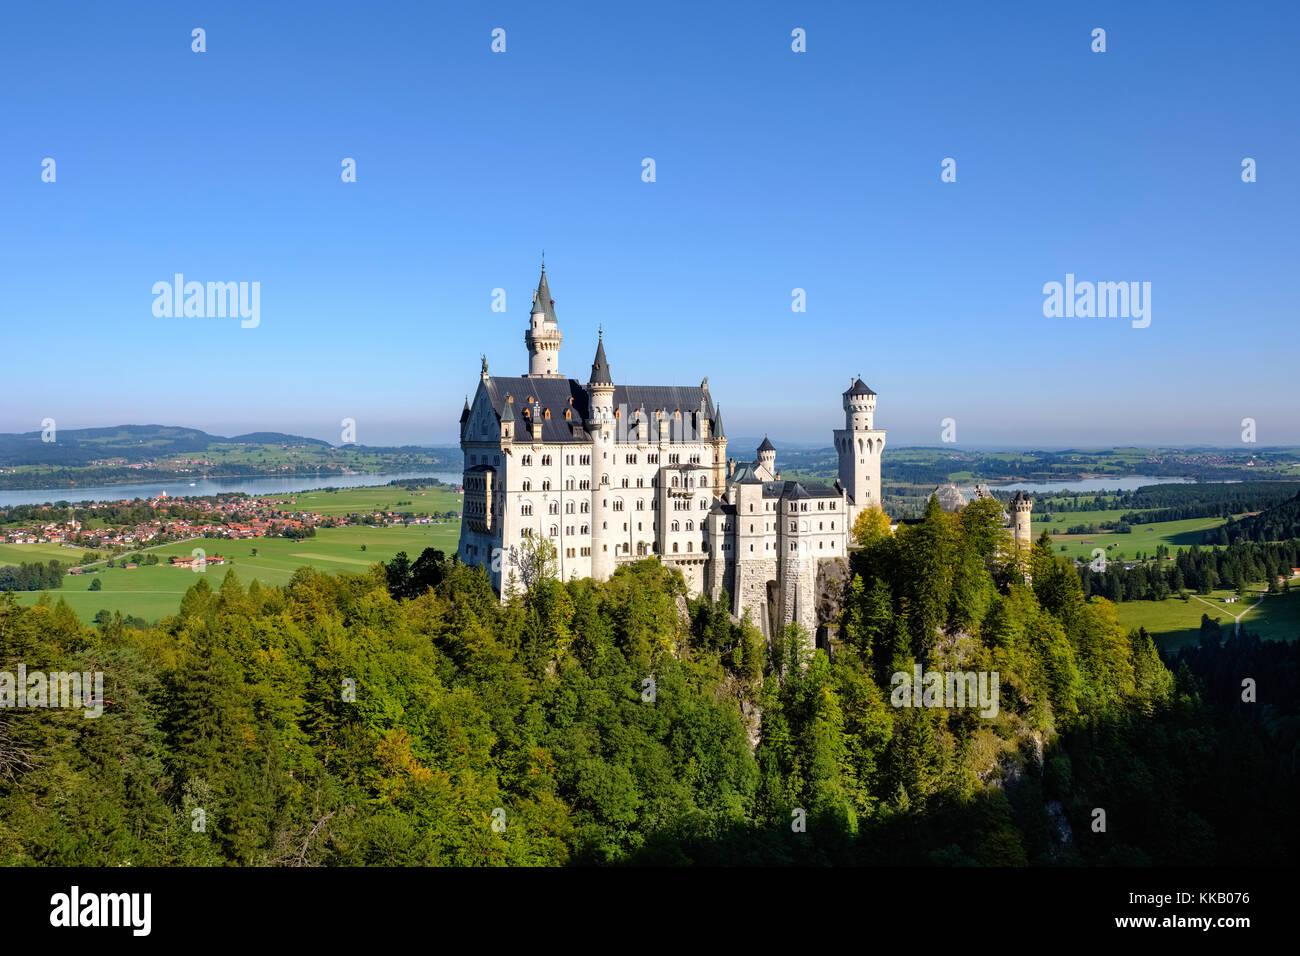 Neuschwanstein Castle, in the back Forggensee, Schwangau, Königswinkel, Ostallgäu, Allgäu, Swabia, Bavaria, Germany Stock Photo